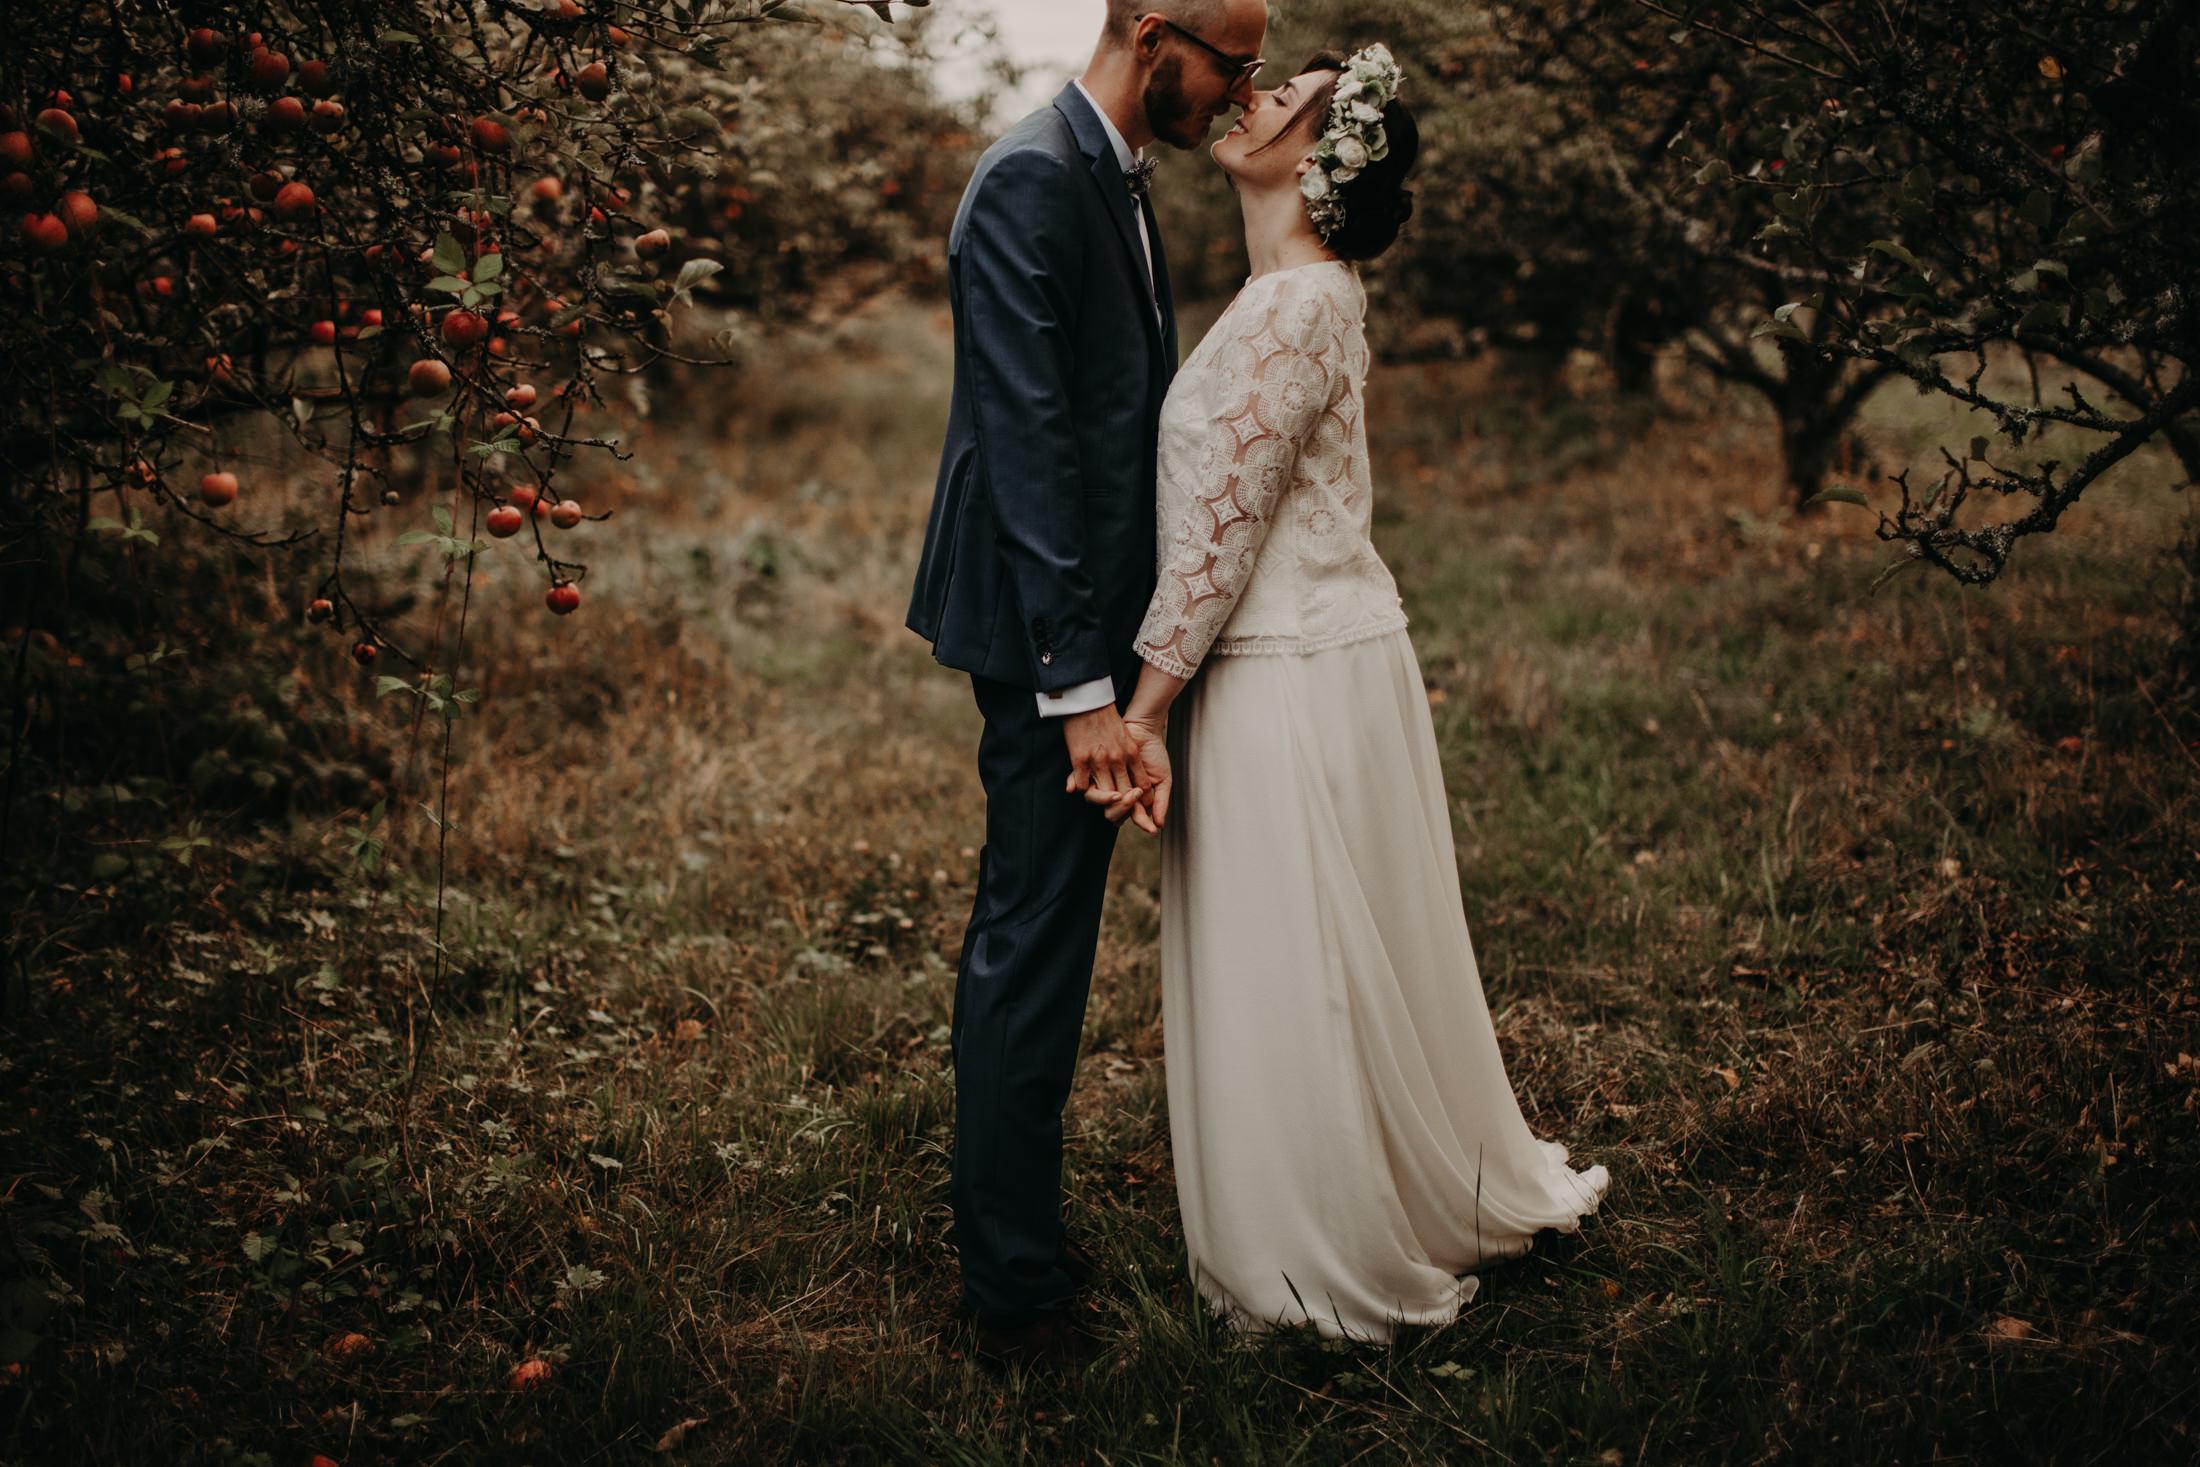 Mariage alsace germany wedding kid-58.jpg